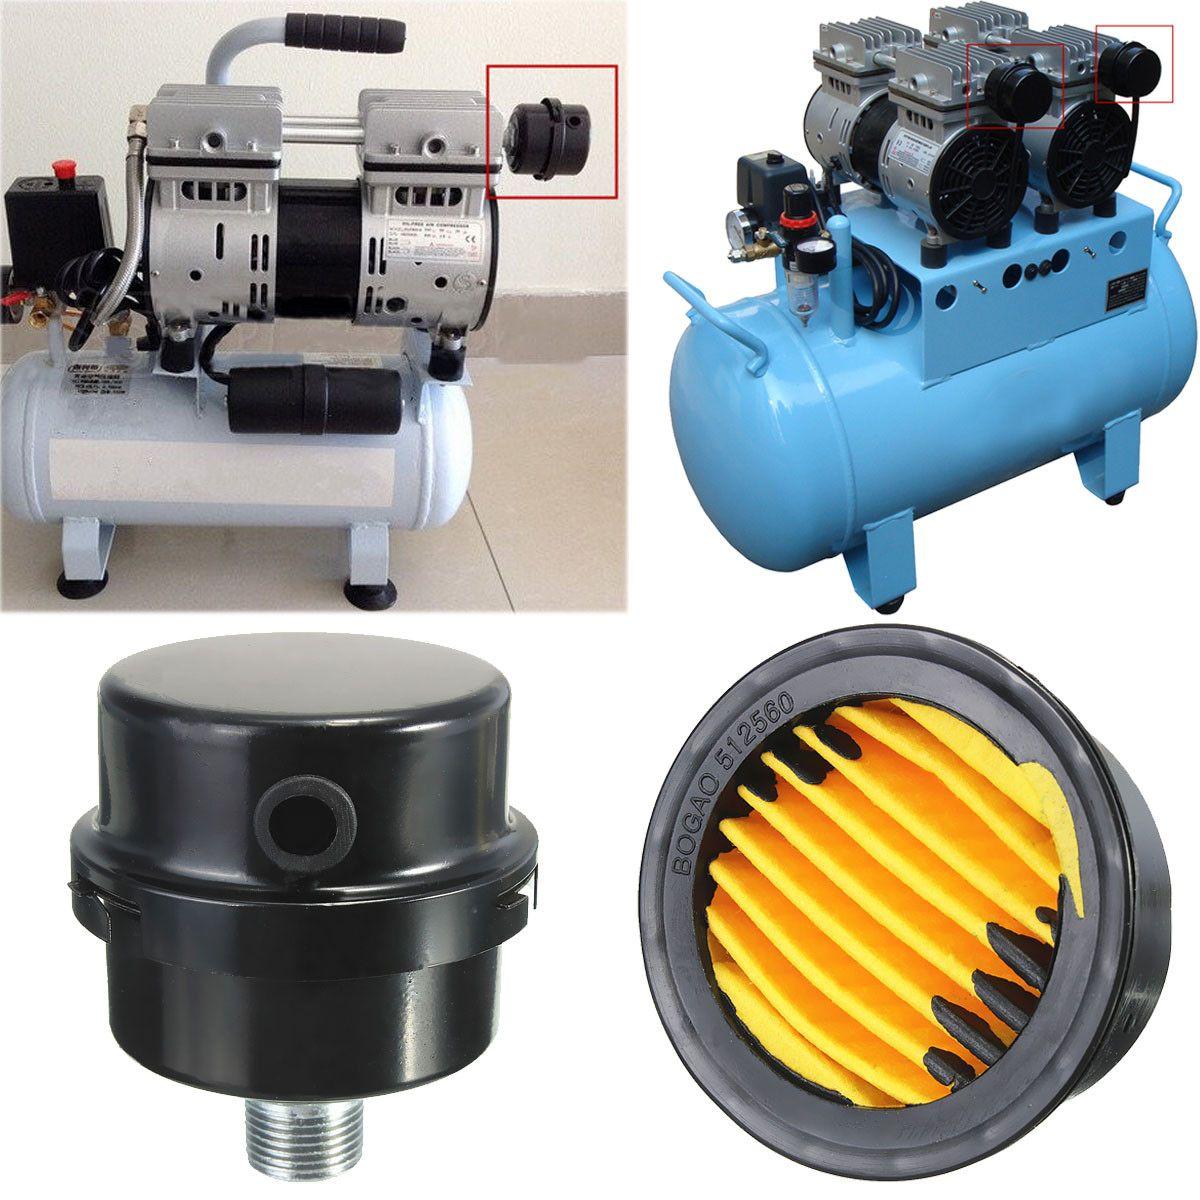 16mm Black Air Filter Filter Silencer Muffler Air Compressor Pneumatic Supply AL